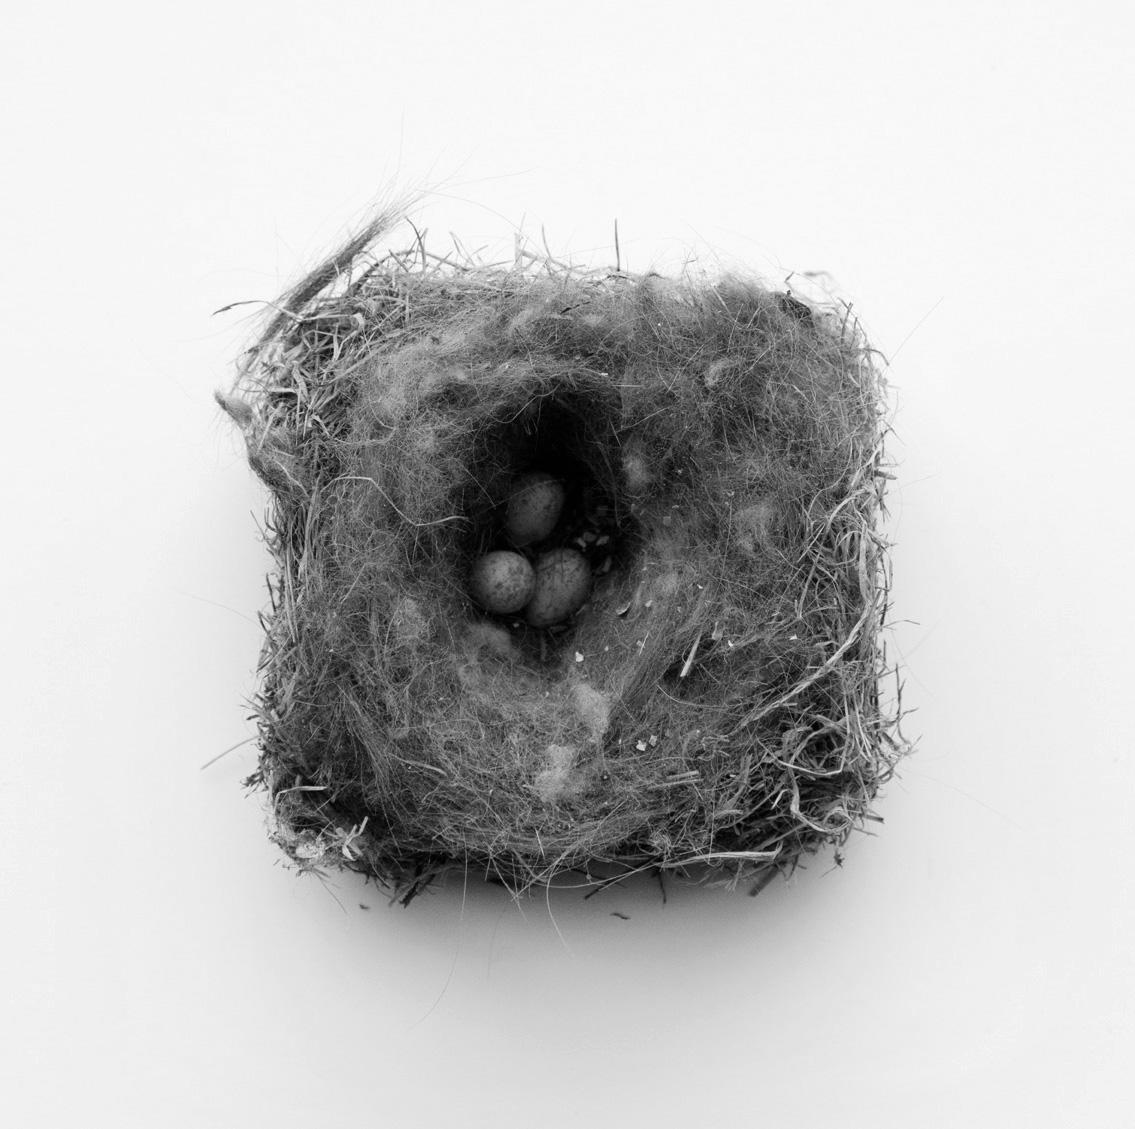 Nest-2654 copy.jpg